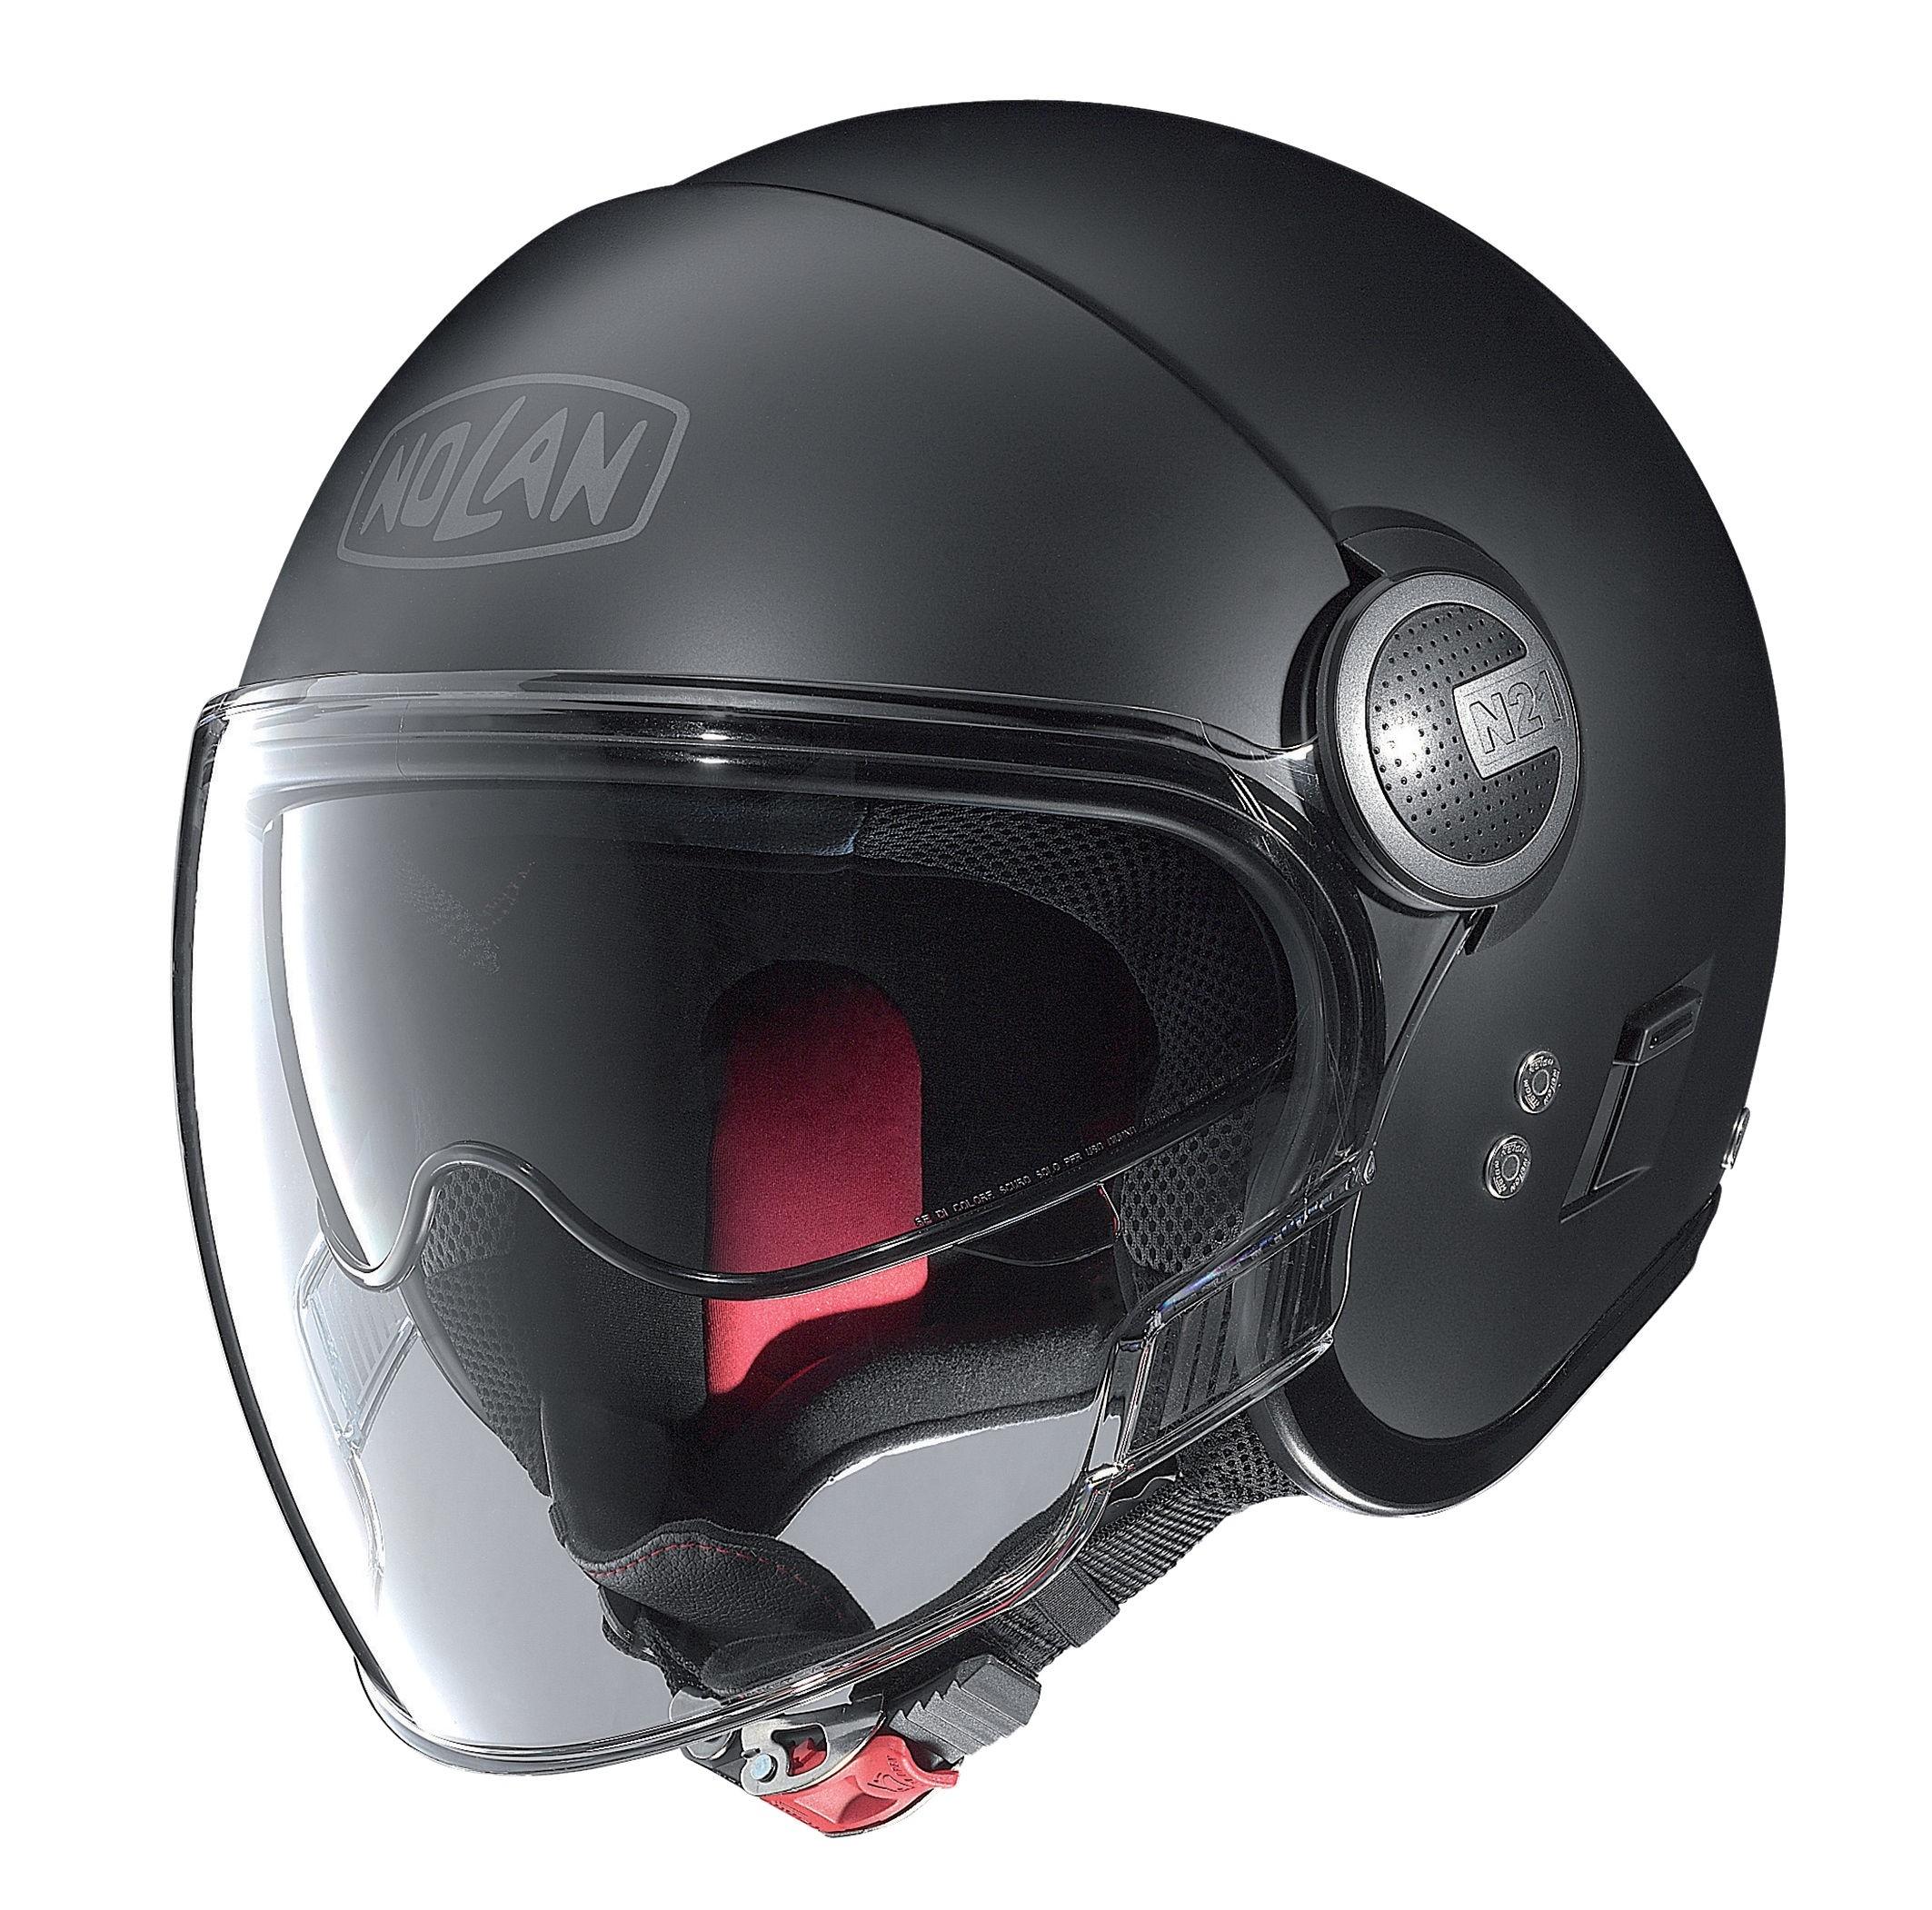 Moto helma Nolan N21 Visor Classic Flat Black 10